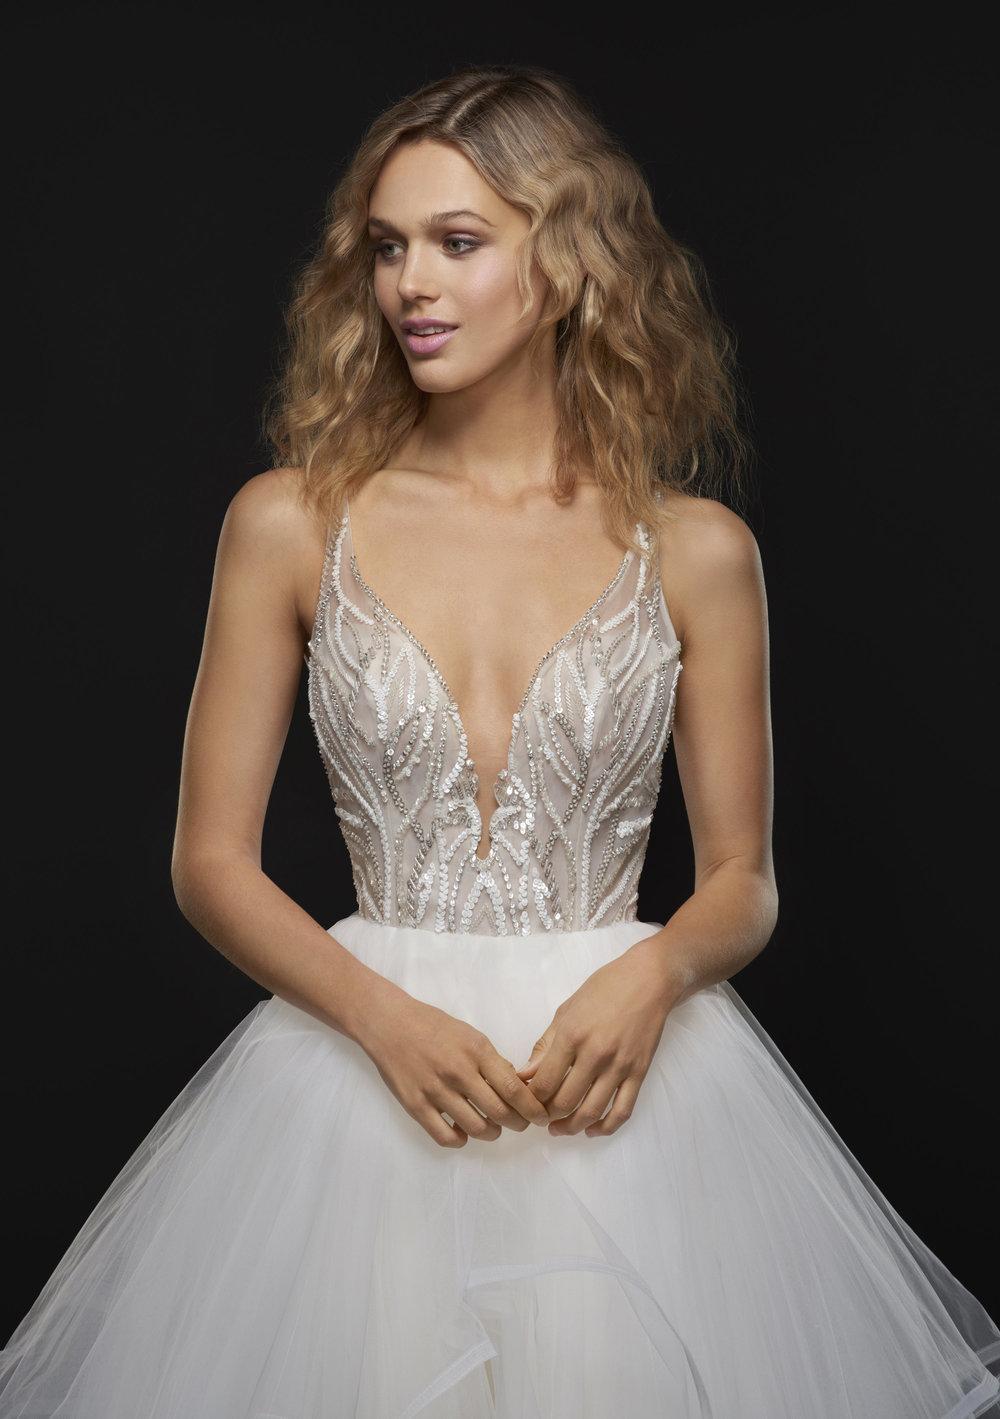 blush-hayley-paige-bridal-fall-2017-style-1750-lincoln_ivory-and-beau-savannah-bridal-boutique-savannah-wedding-dresses-savannah-bridal-shop.jpg